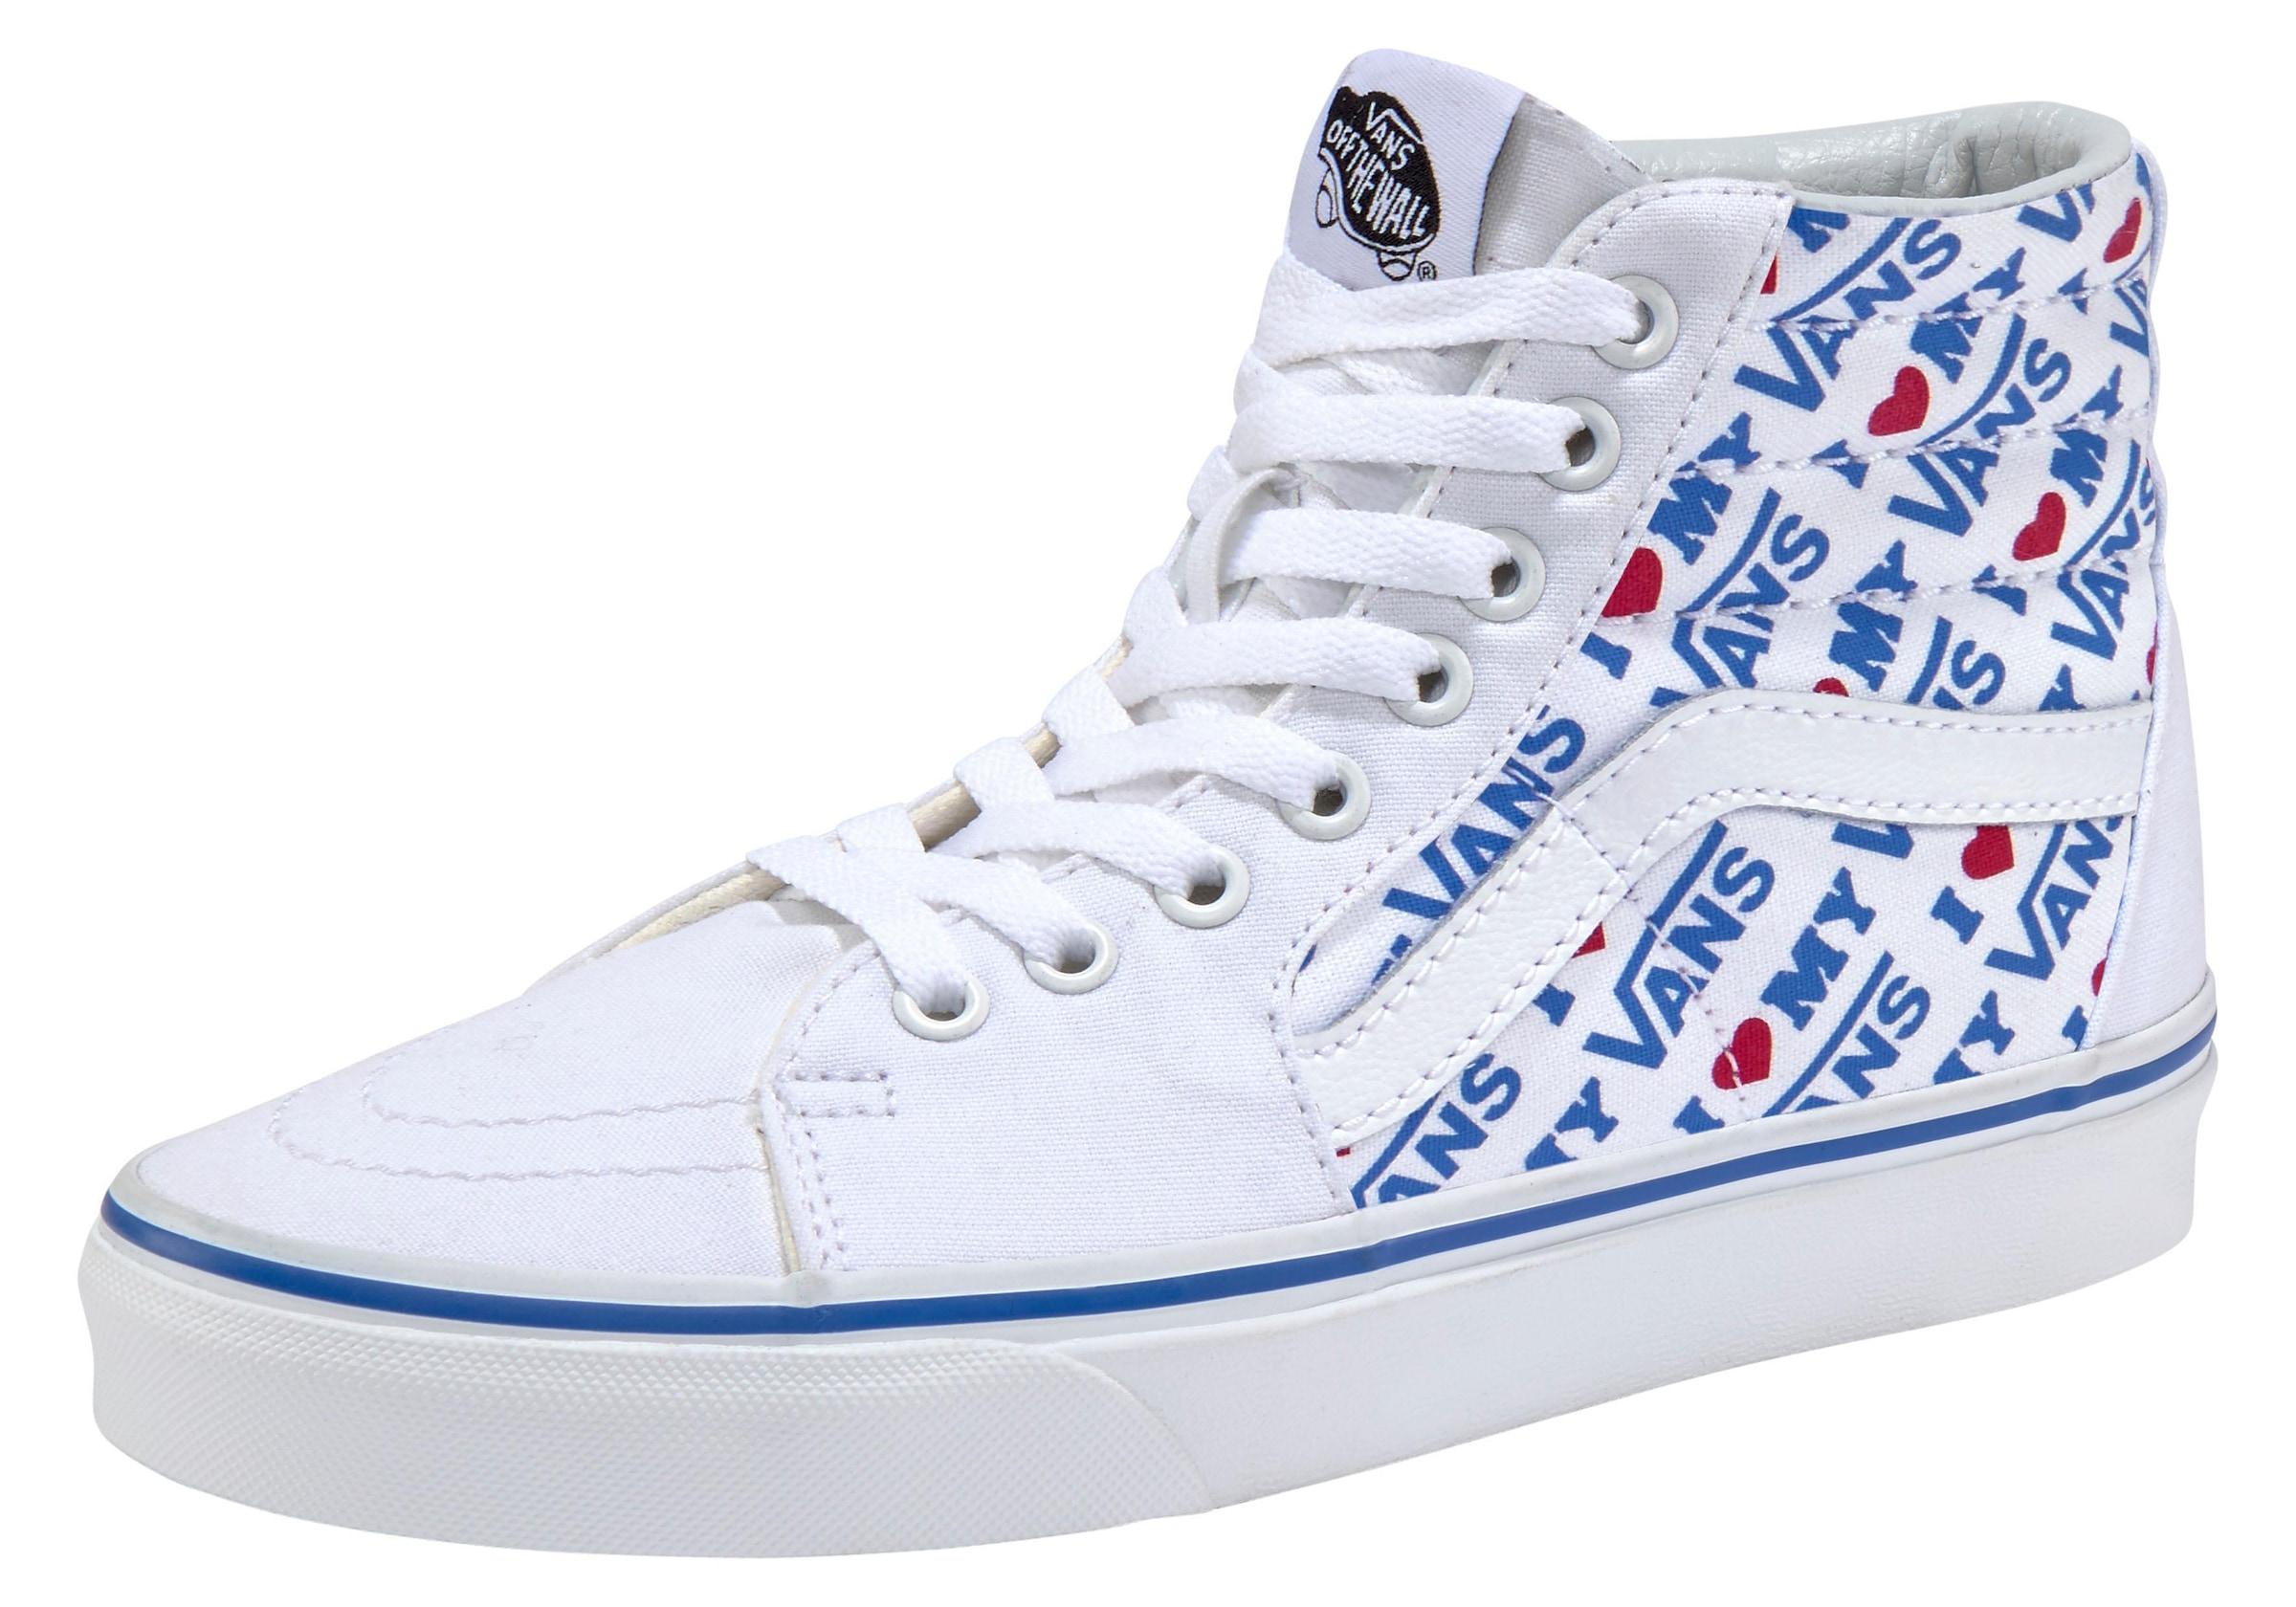 Vans Sneaker »Sk8 hi« bestellen | BAUR